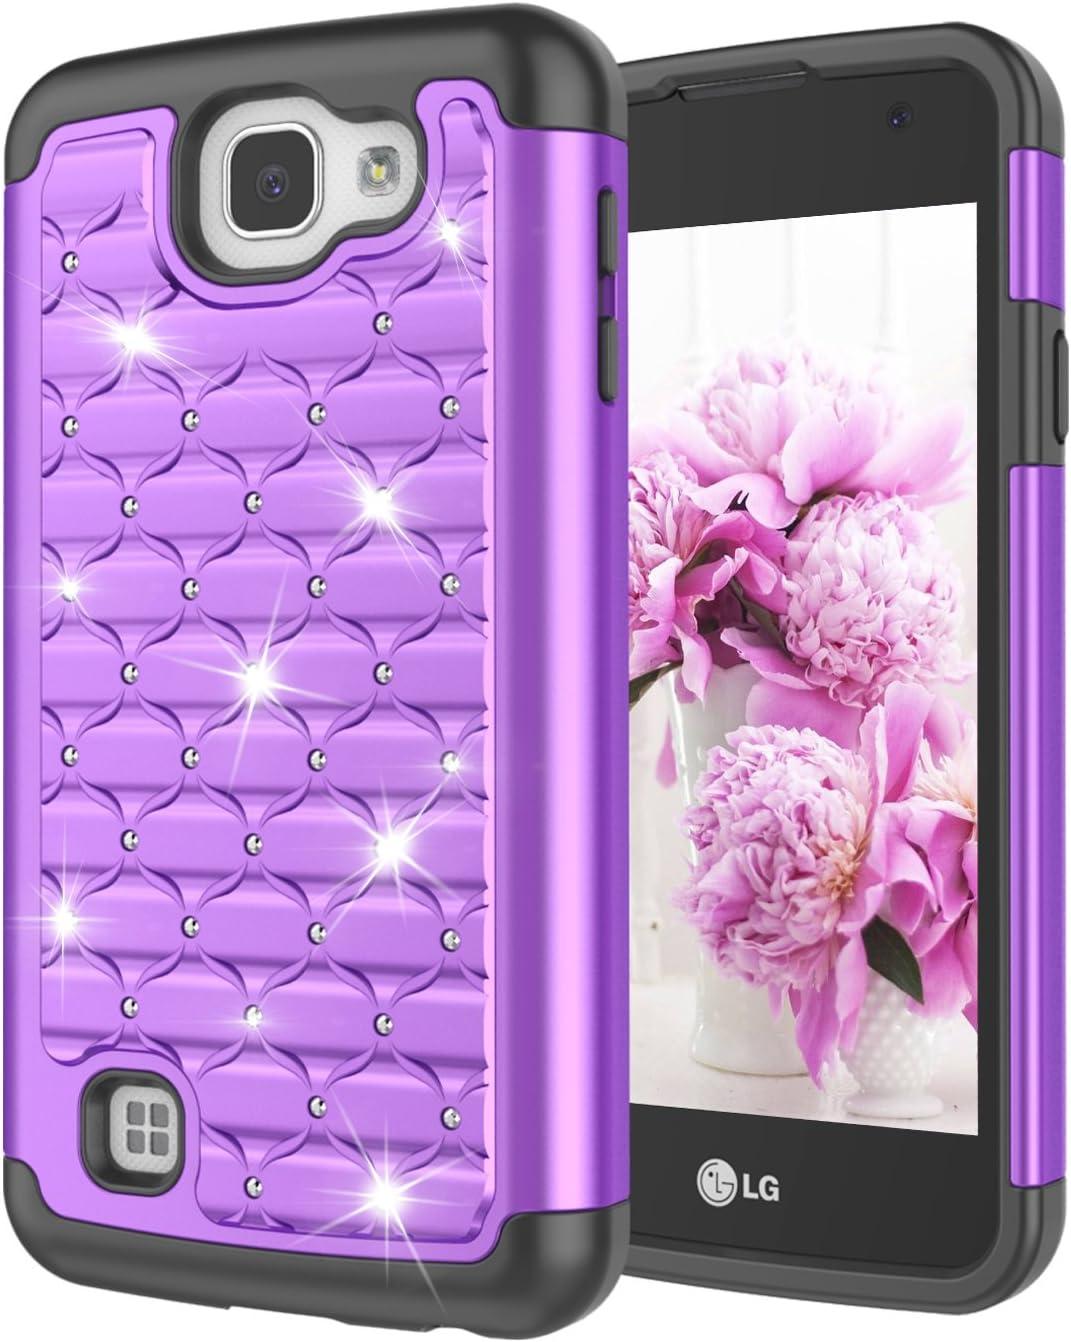 LG Rebel LTE Case, LG K4 Case, LG Optimus Zone 3/Spree Case, Jeylly [Diamond Star] Hybrid Rubber Plastic Shock Absorbing Studded Rhinestone Crystal Bling Armor Defender Rugged Case Cover - Purple